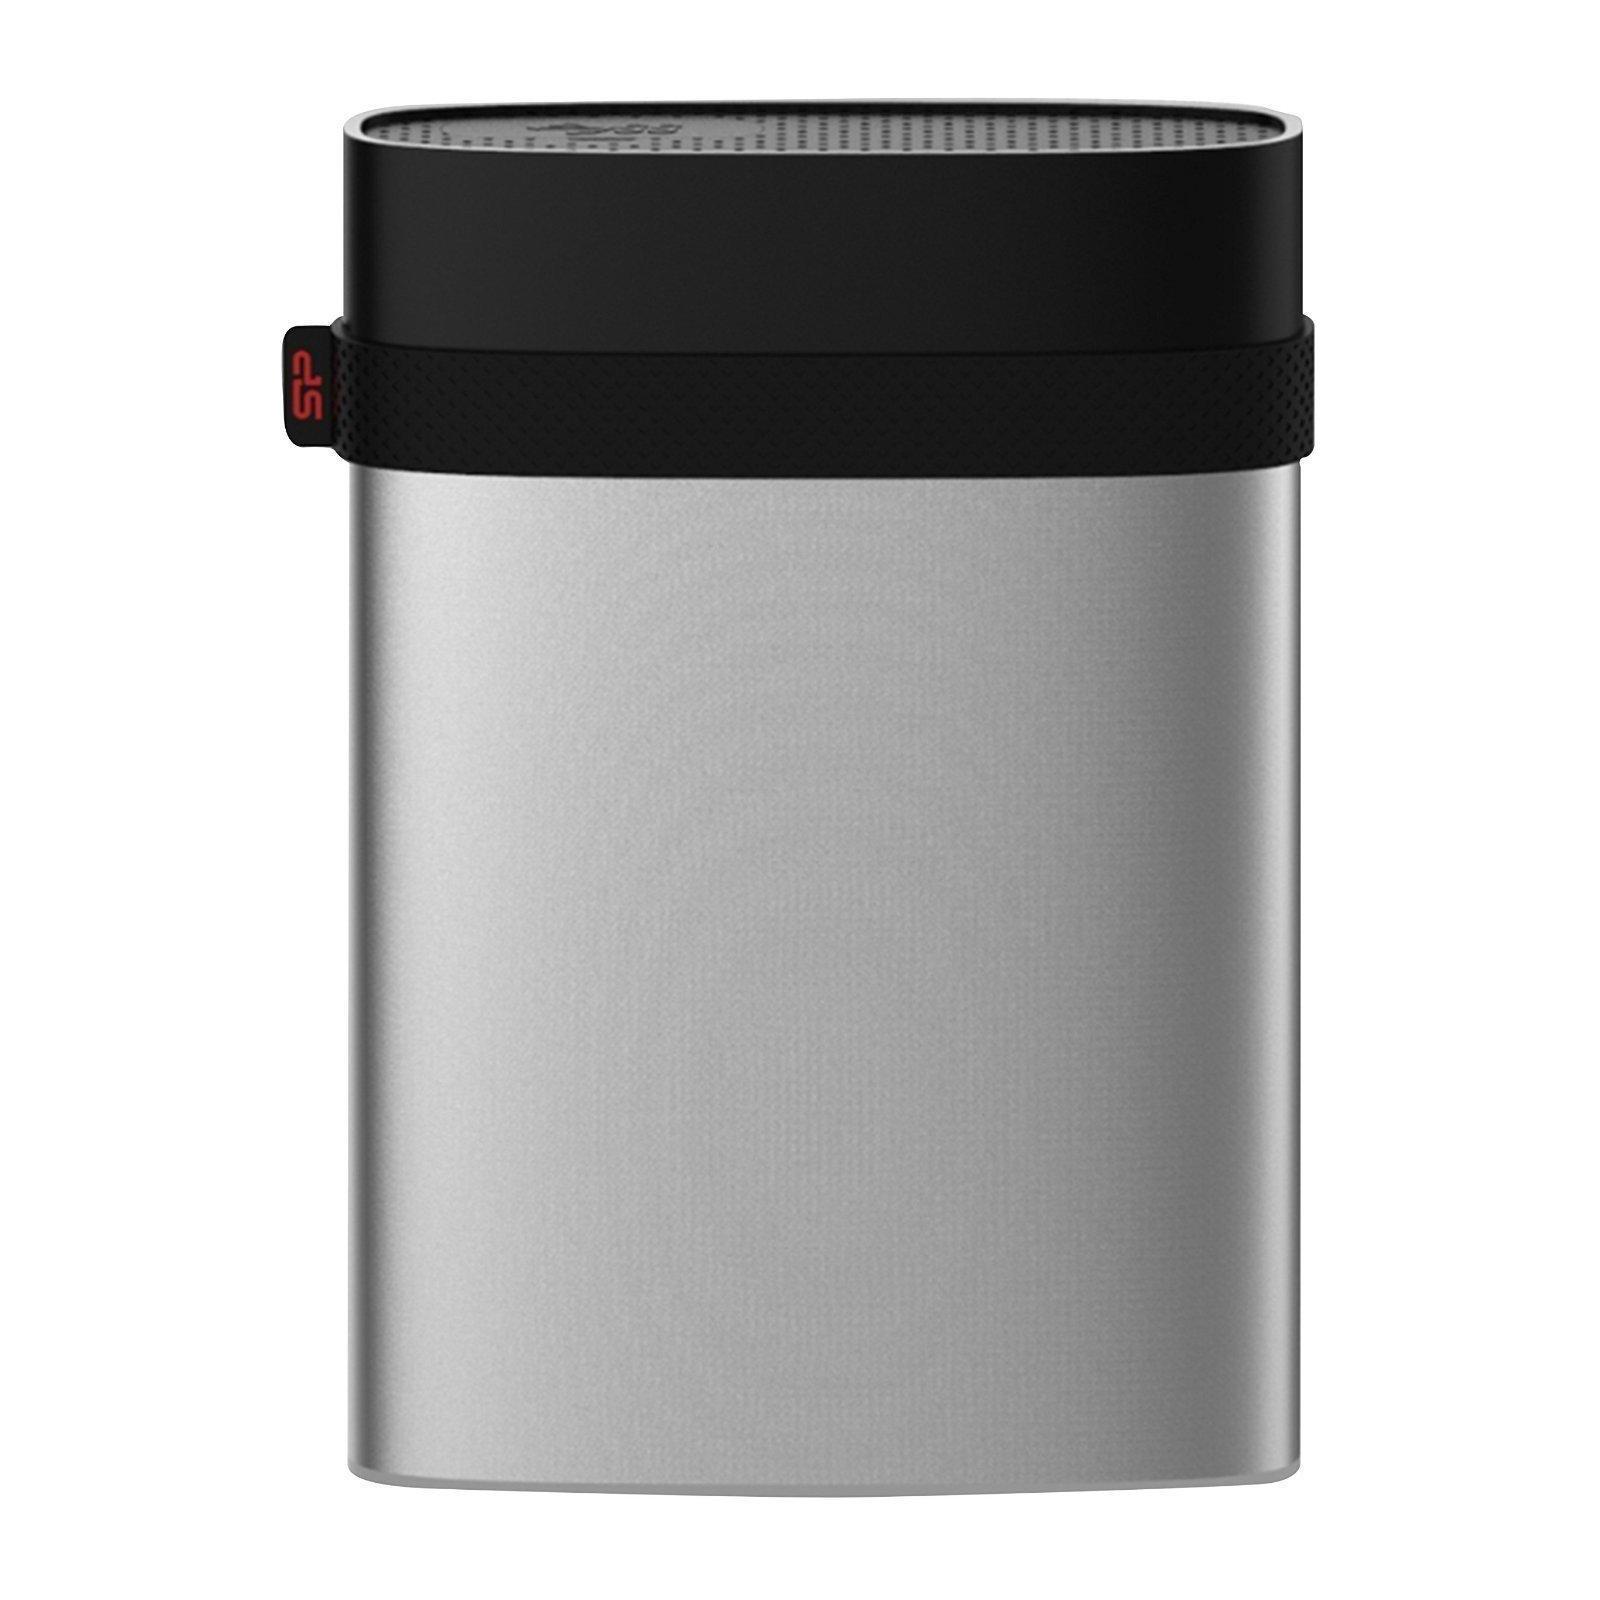 "Внешний жесткий диск 2.5"" 5TB Silicon Power (SP050TBPHDA85S3S)"